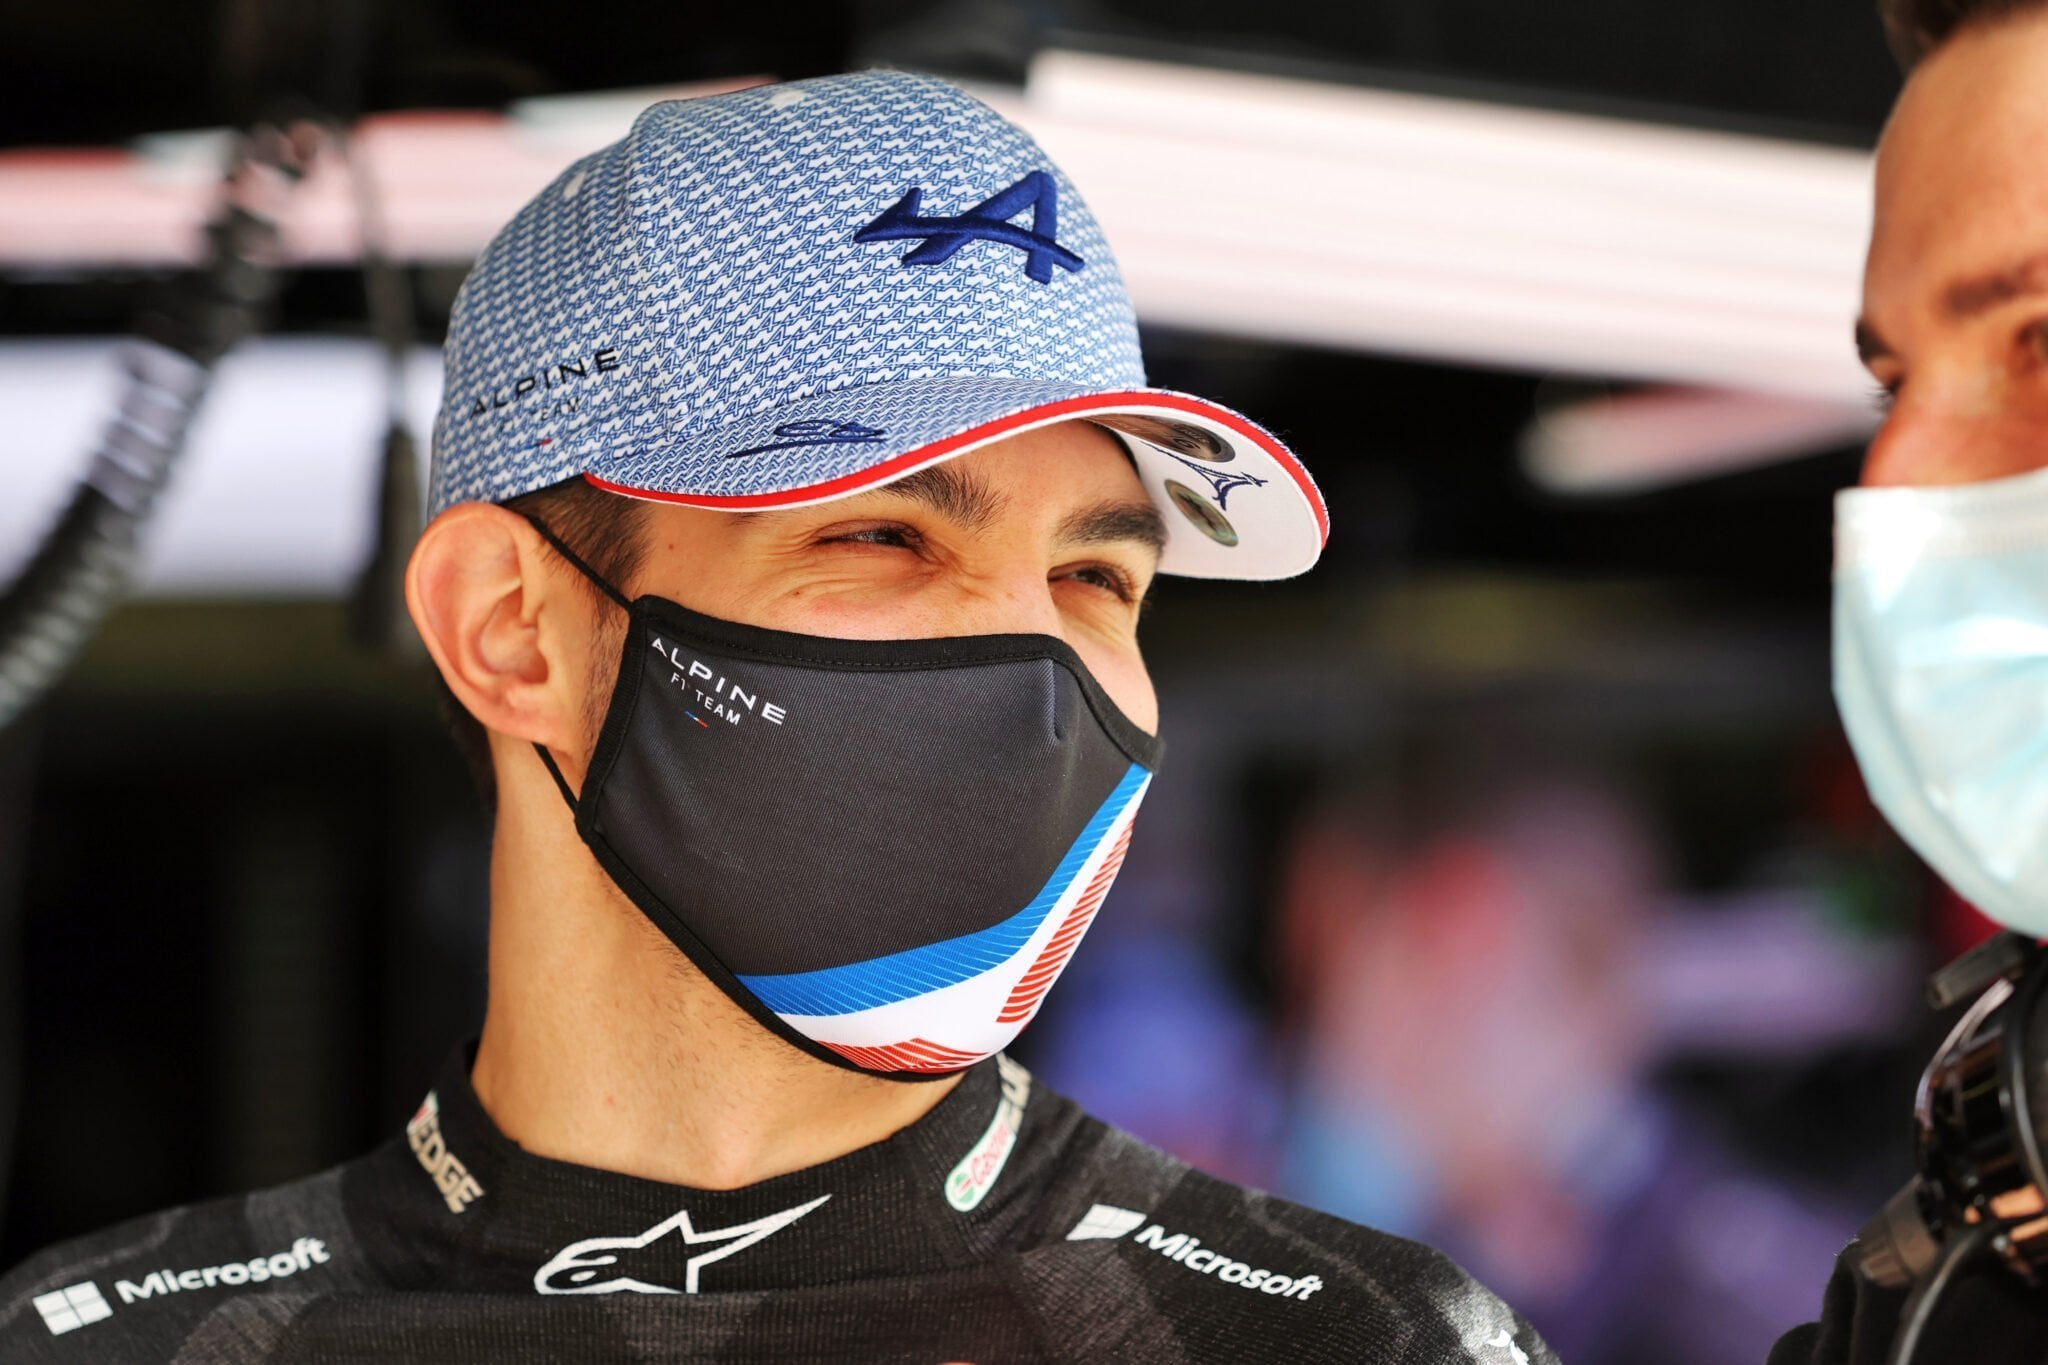 Alpine F1 Team Esteban Ocon A521 Bahrein